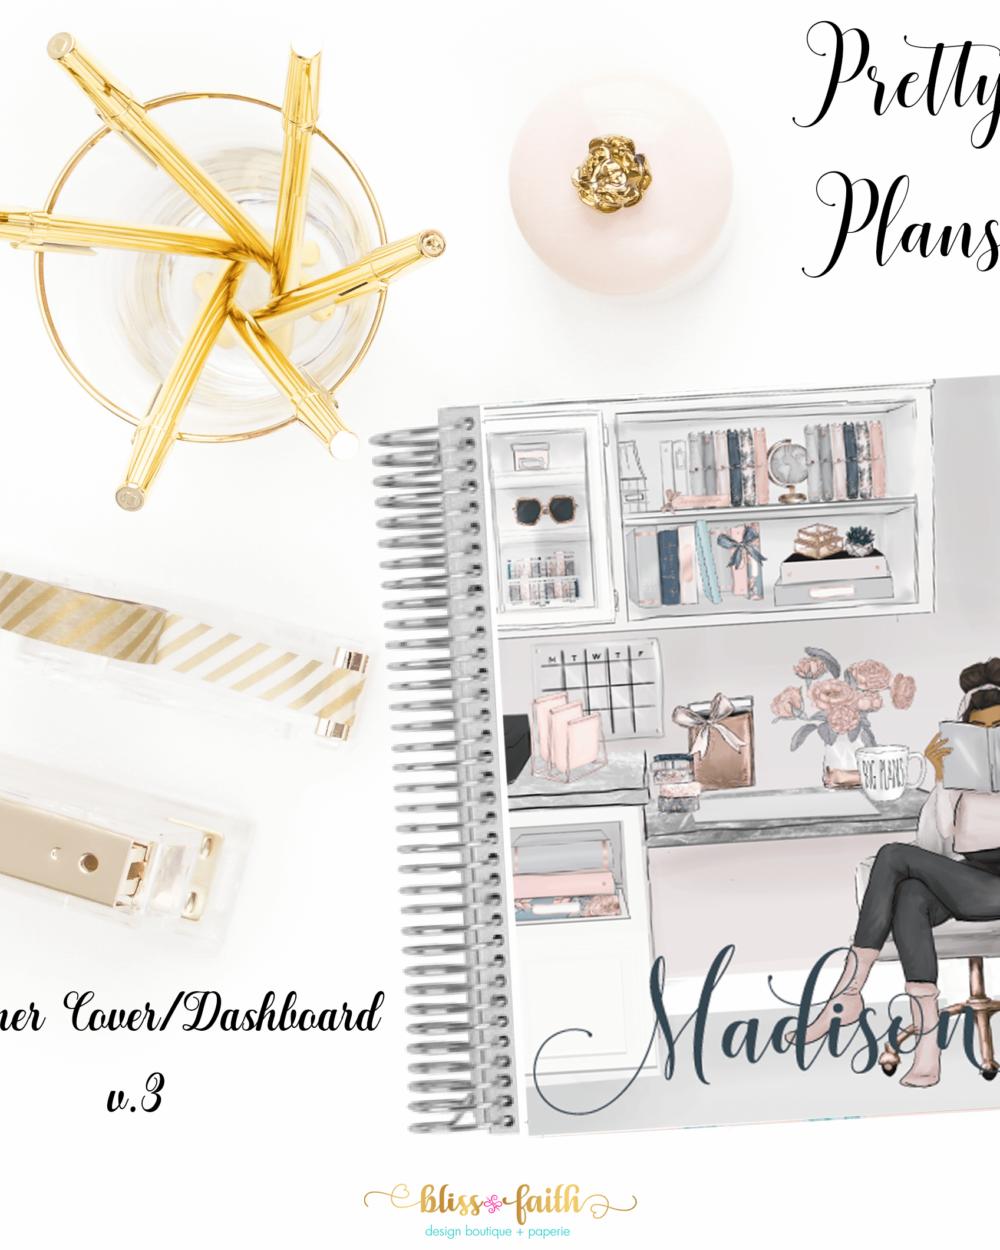 Pretty Plans Planner Cover/Dashboard | blissandfaith.com